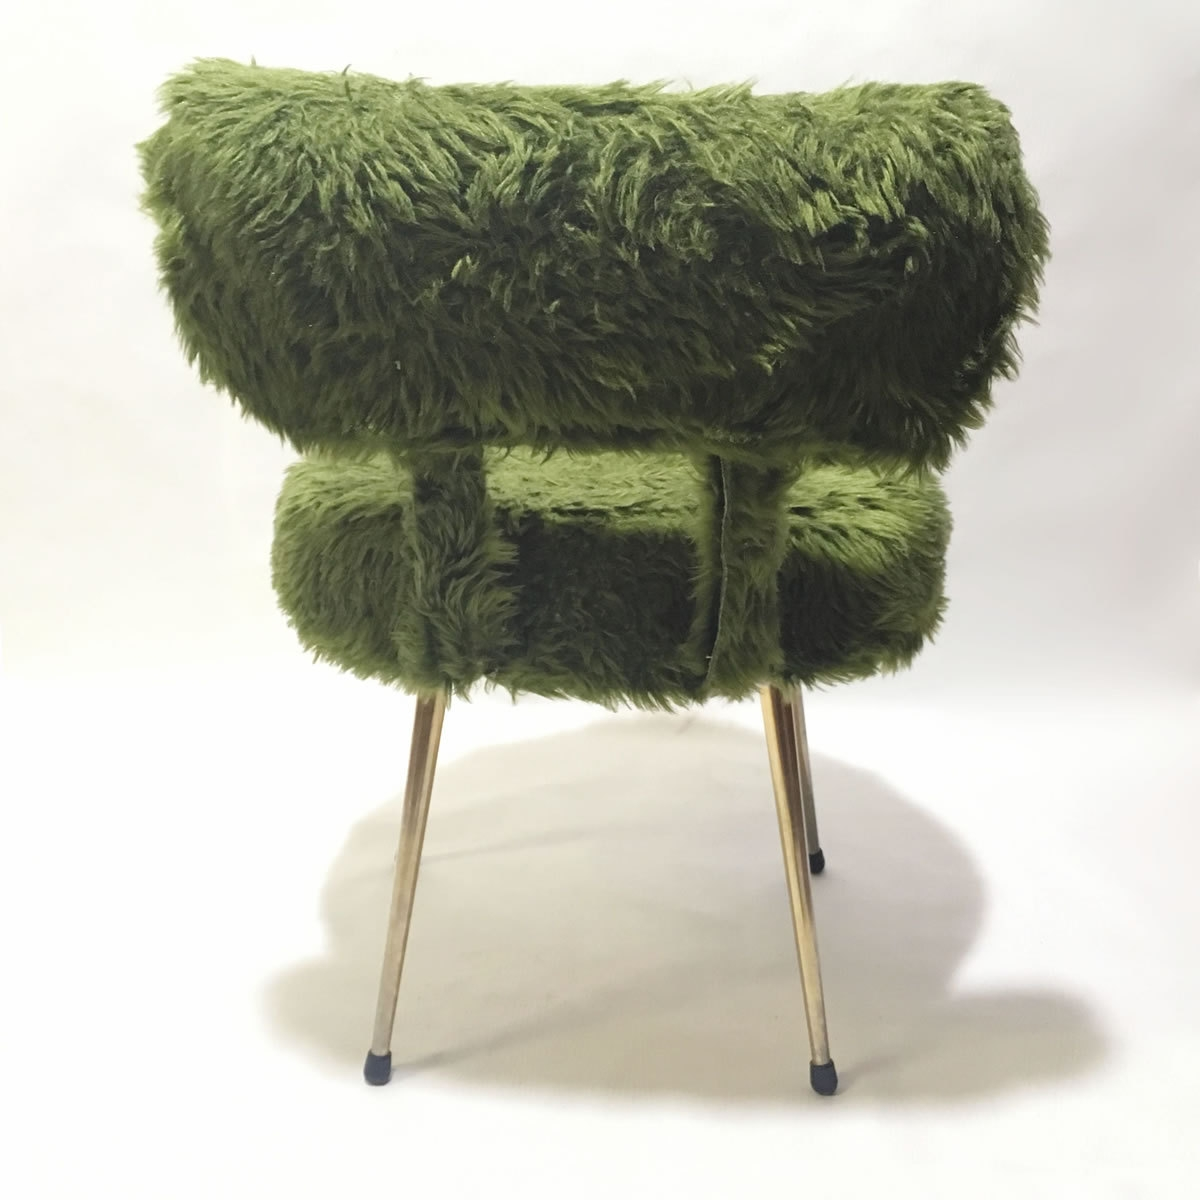 chaise moumoute verte 70s luckyfind. Black Bedroom Furniture Sets. Home Design Ideas